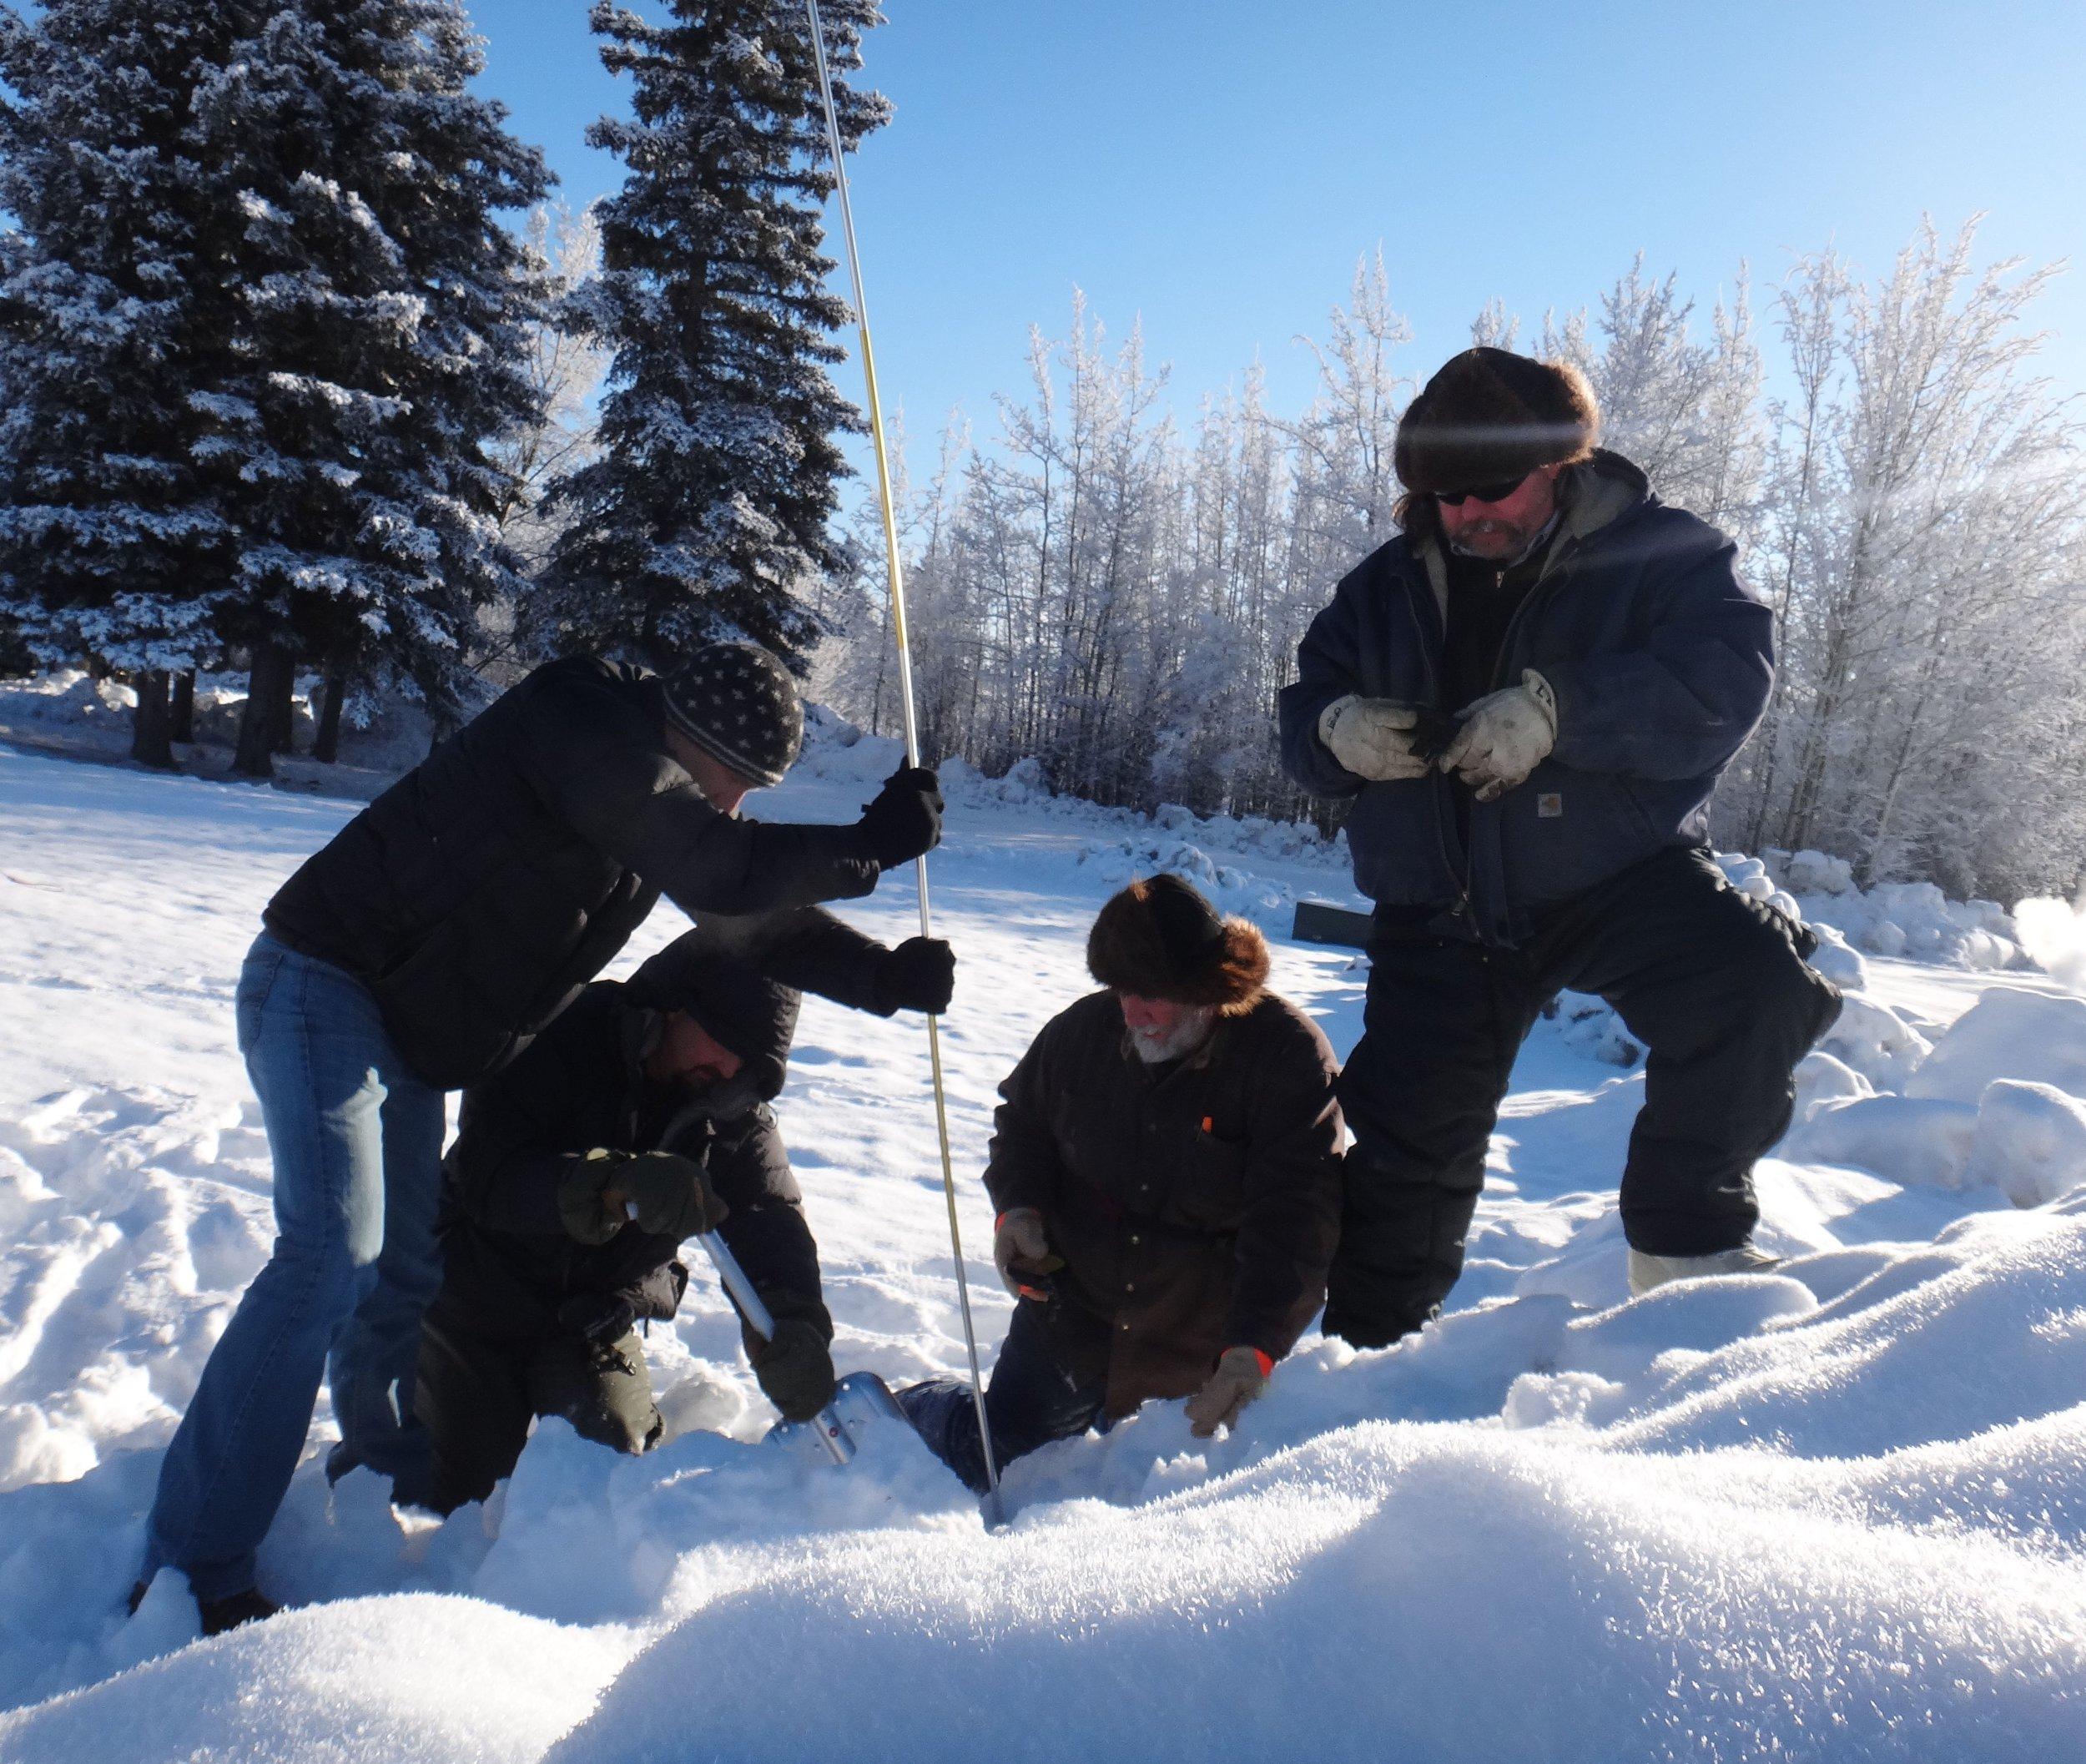 Glennallen crew practicing companion rescue. Photo by S. Carter.